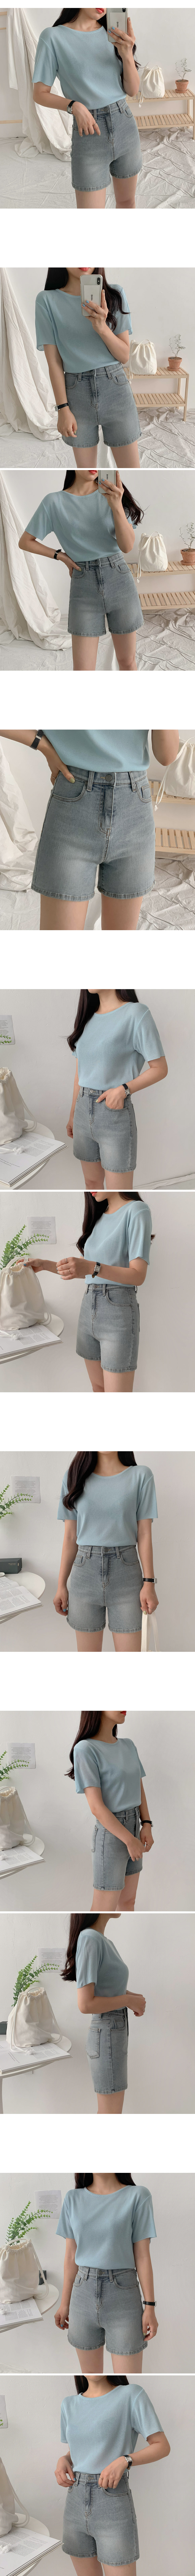 Main Round Short Sleeve Knit